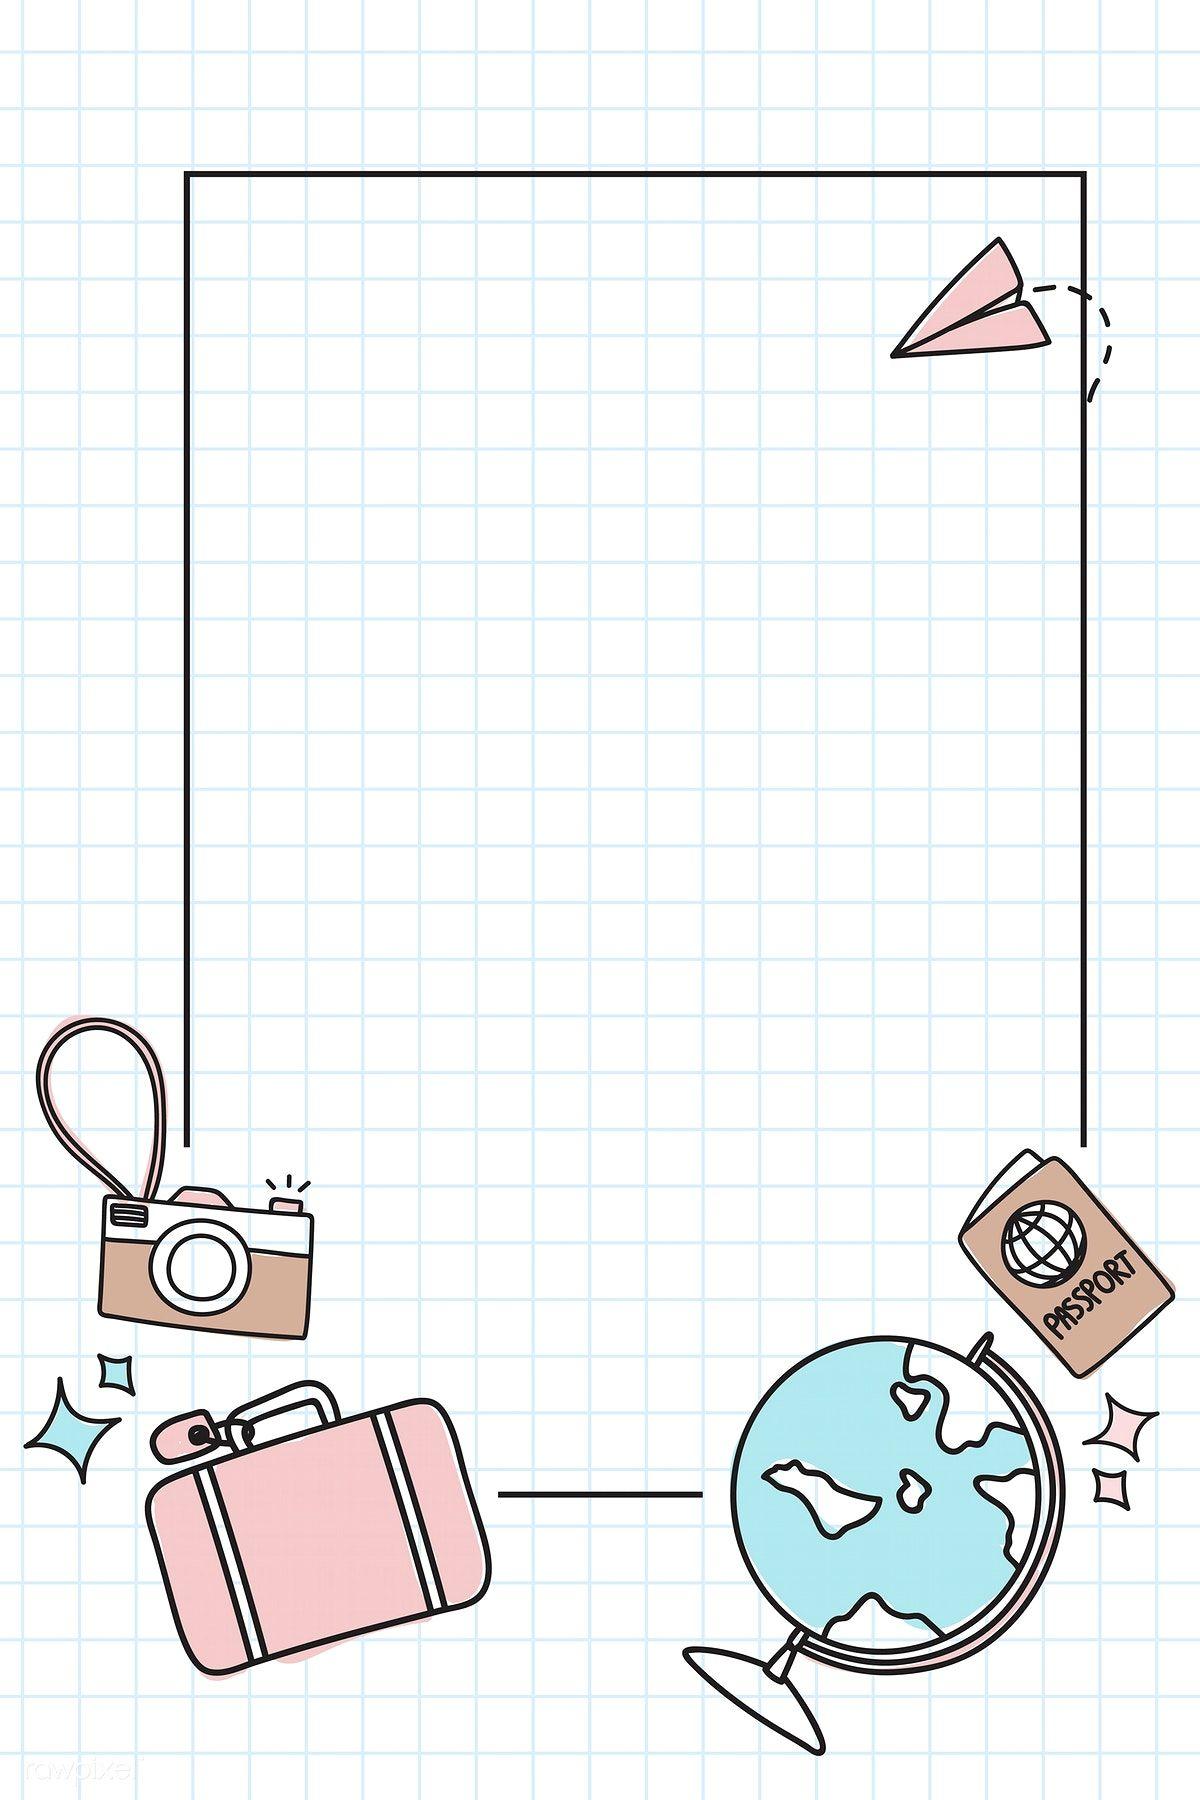 Download premium vector of Hand drawn travel element background vector set